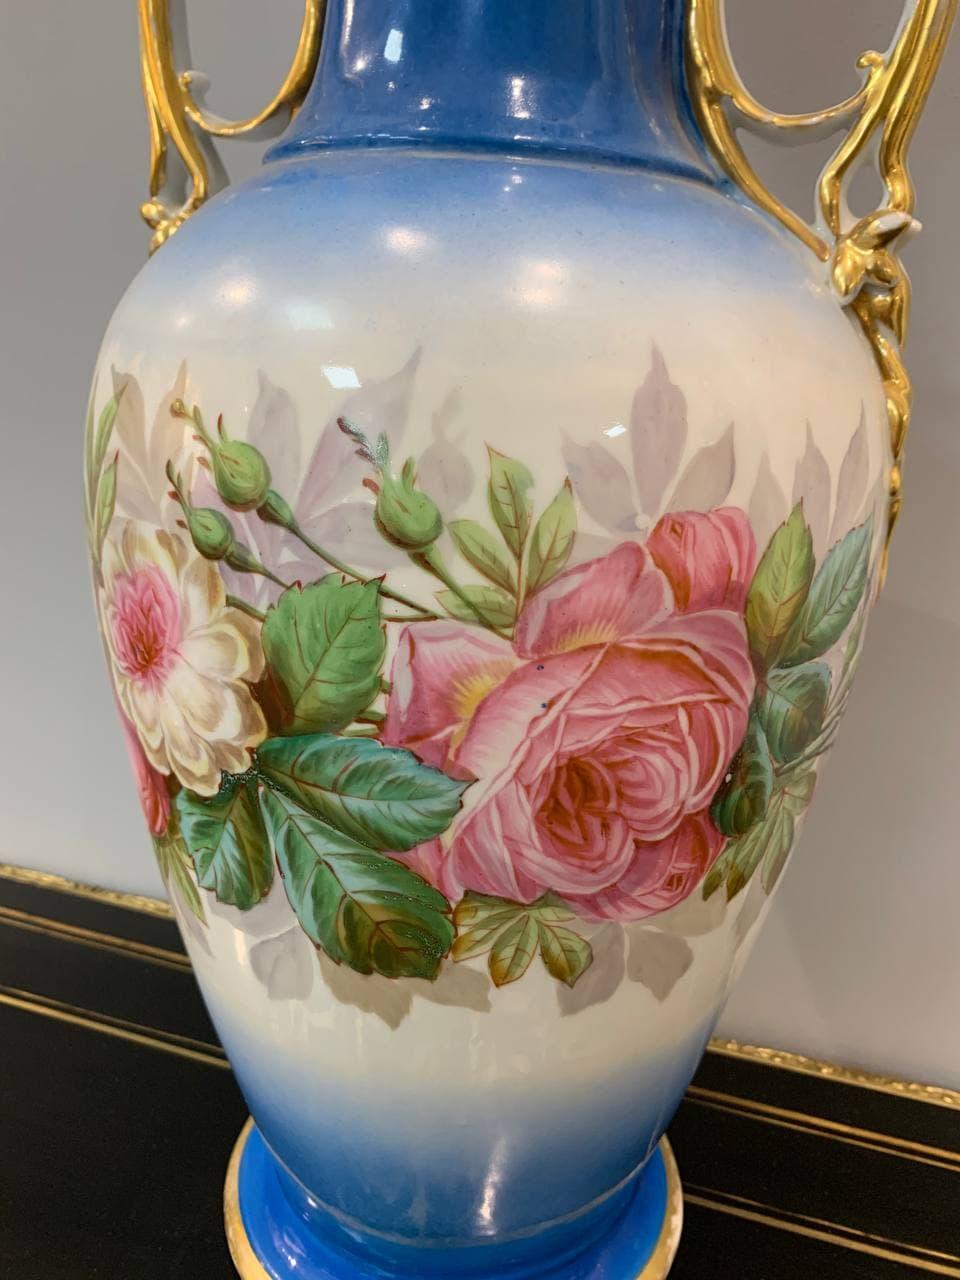 Антикварная ваза мануфактуры Vieux Paris